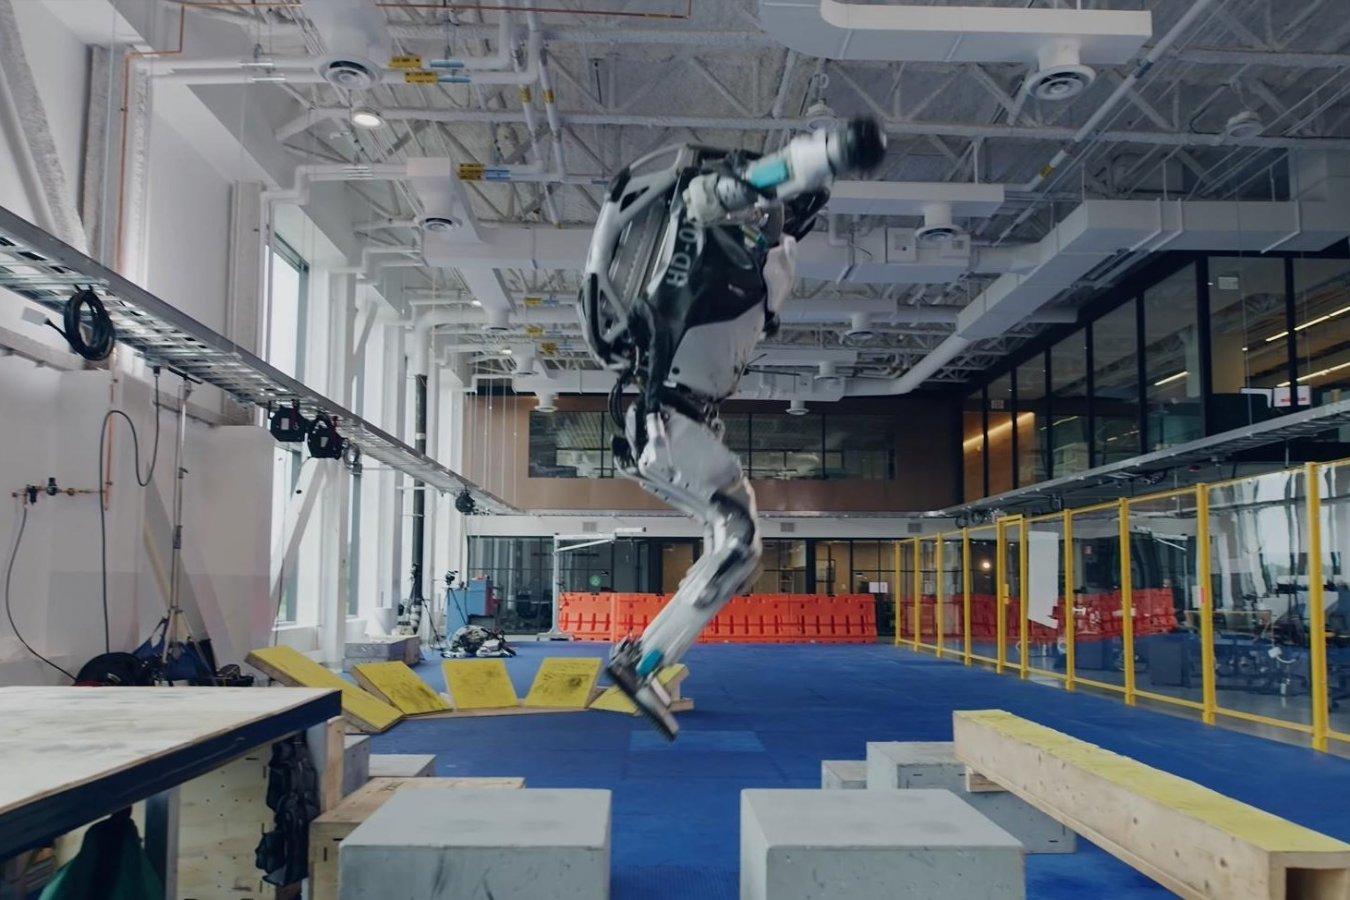 Робот Boston Dynamics научился паркуру прямо как в Assassins Creed и Mirrors Edge